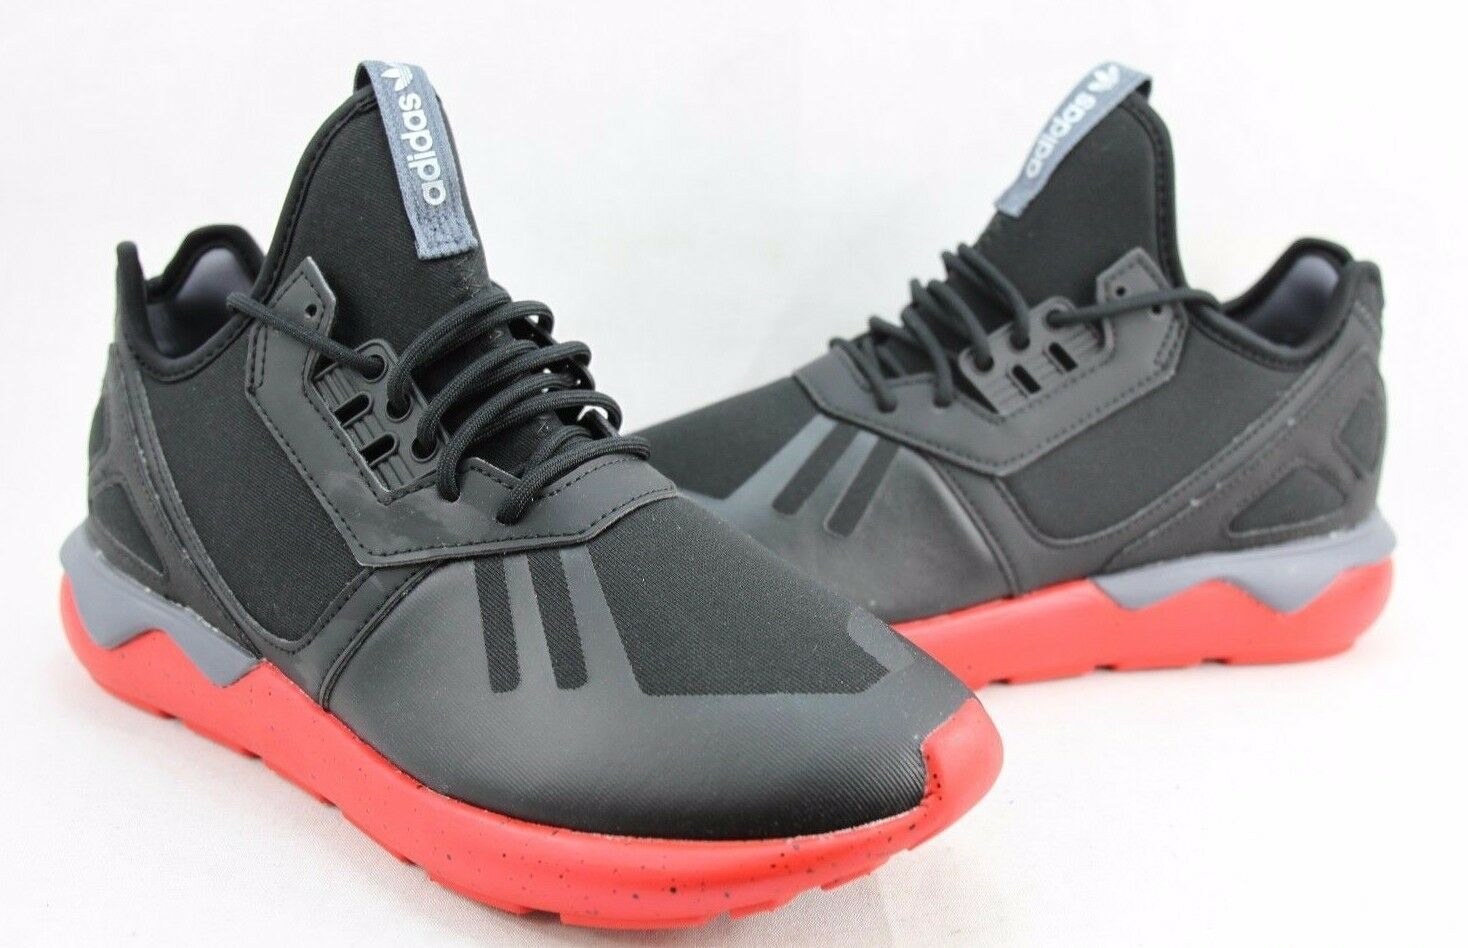 Adidas tubulare runner nero rosso pomodoro aq8387 8 b634a9